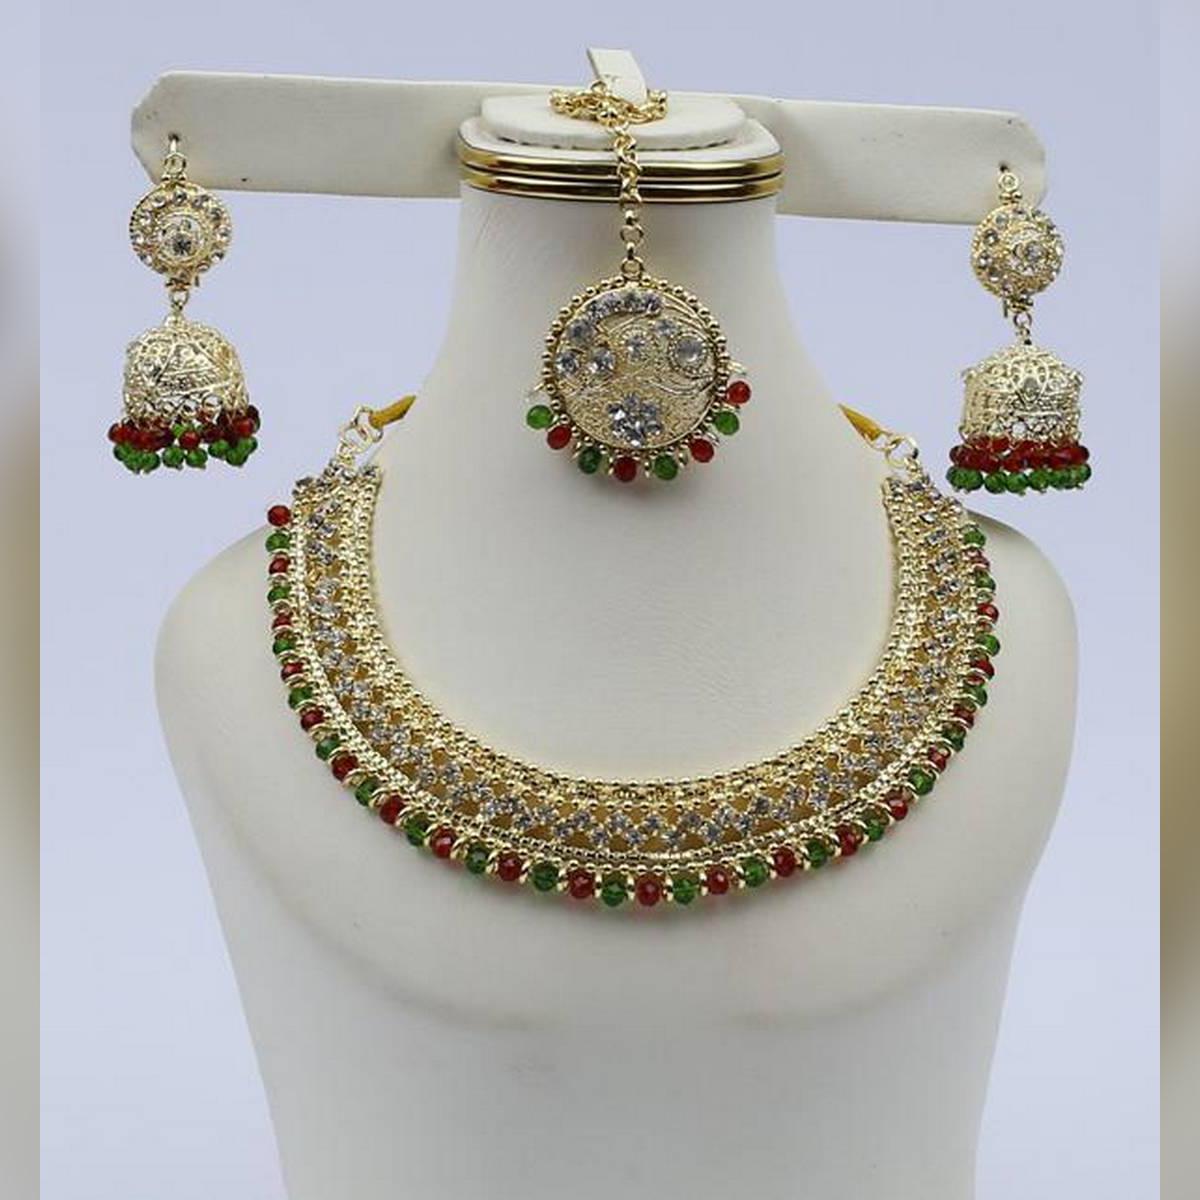 Sensational Bridal Designer Fashionable Jewellery Set For Women